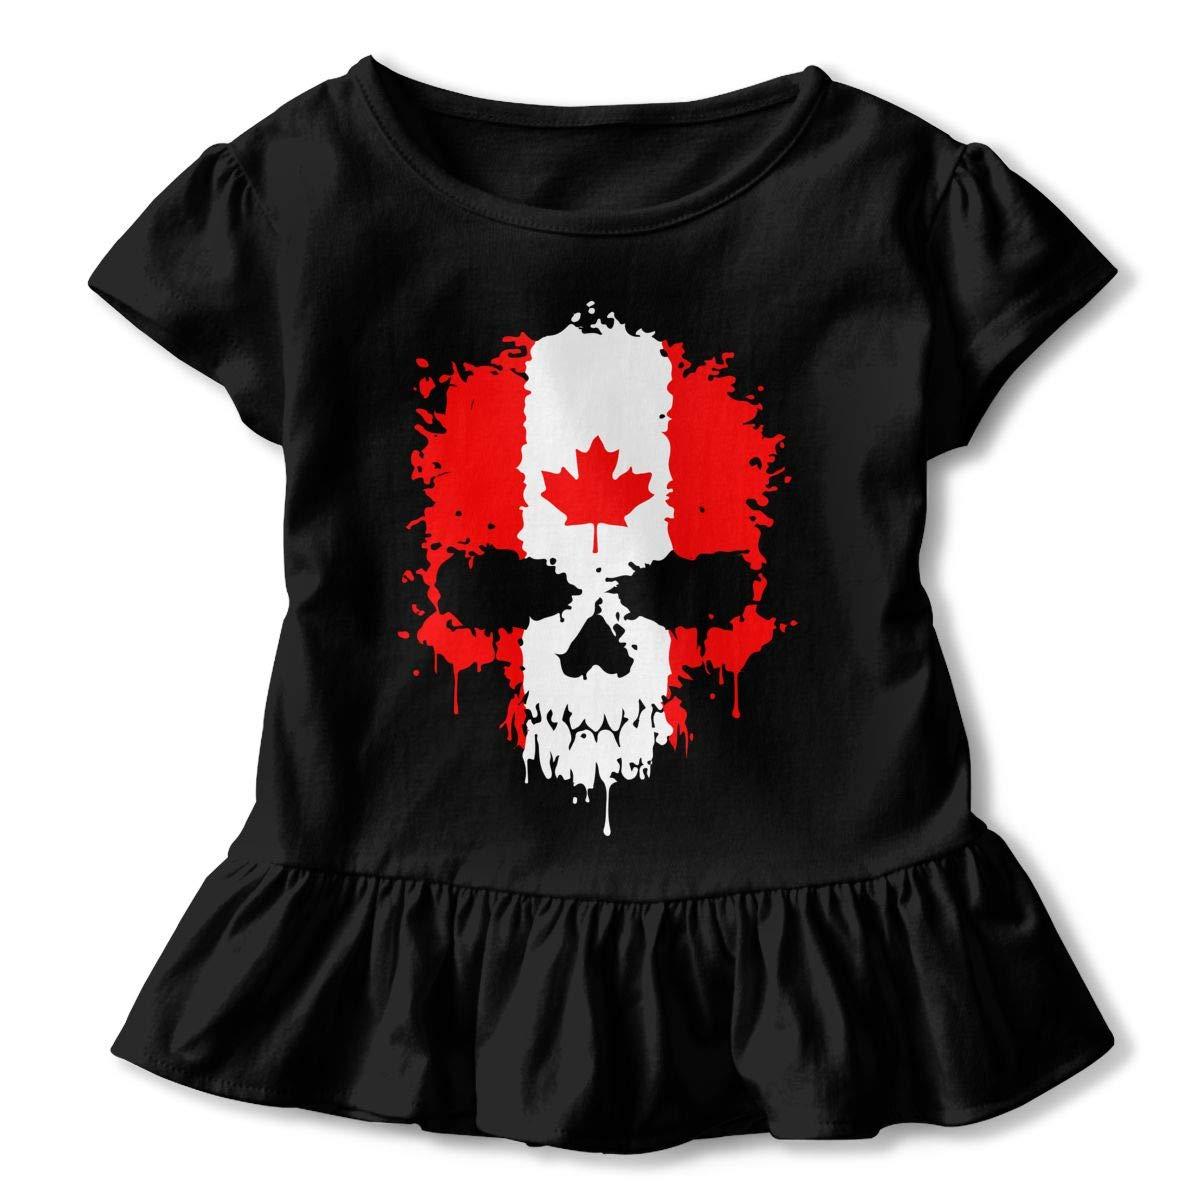 Canadian Flag Skull Kids Girls Short Sleeve T Shirts Ruffles Shirt Tee for 2-6T